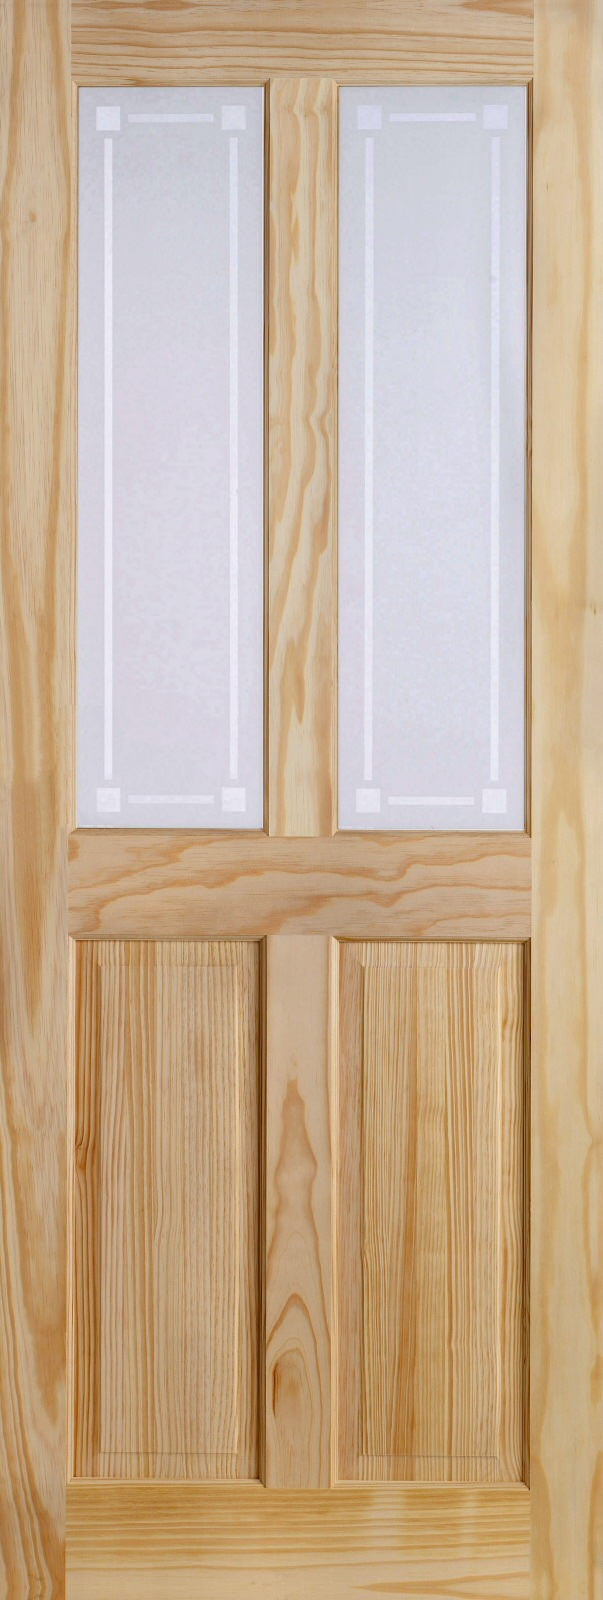 on sale ca815 da0d2 27 x 78 4-Panel 2-Light Pine Door Obscure Glass